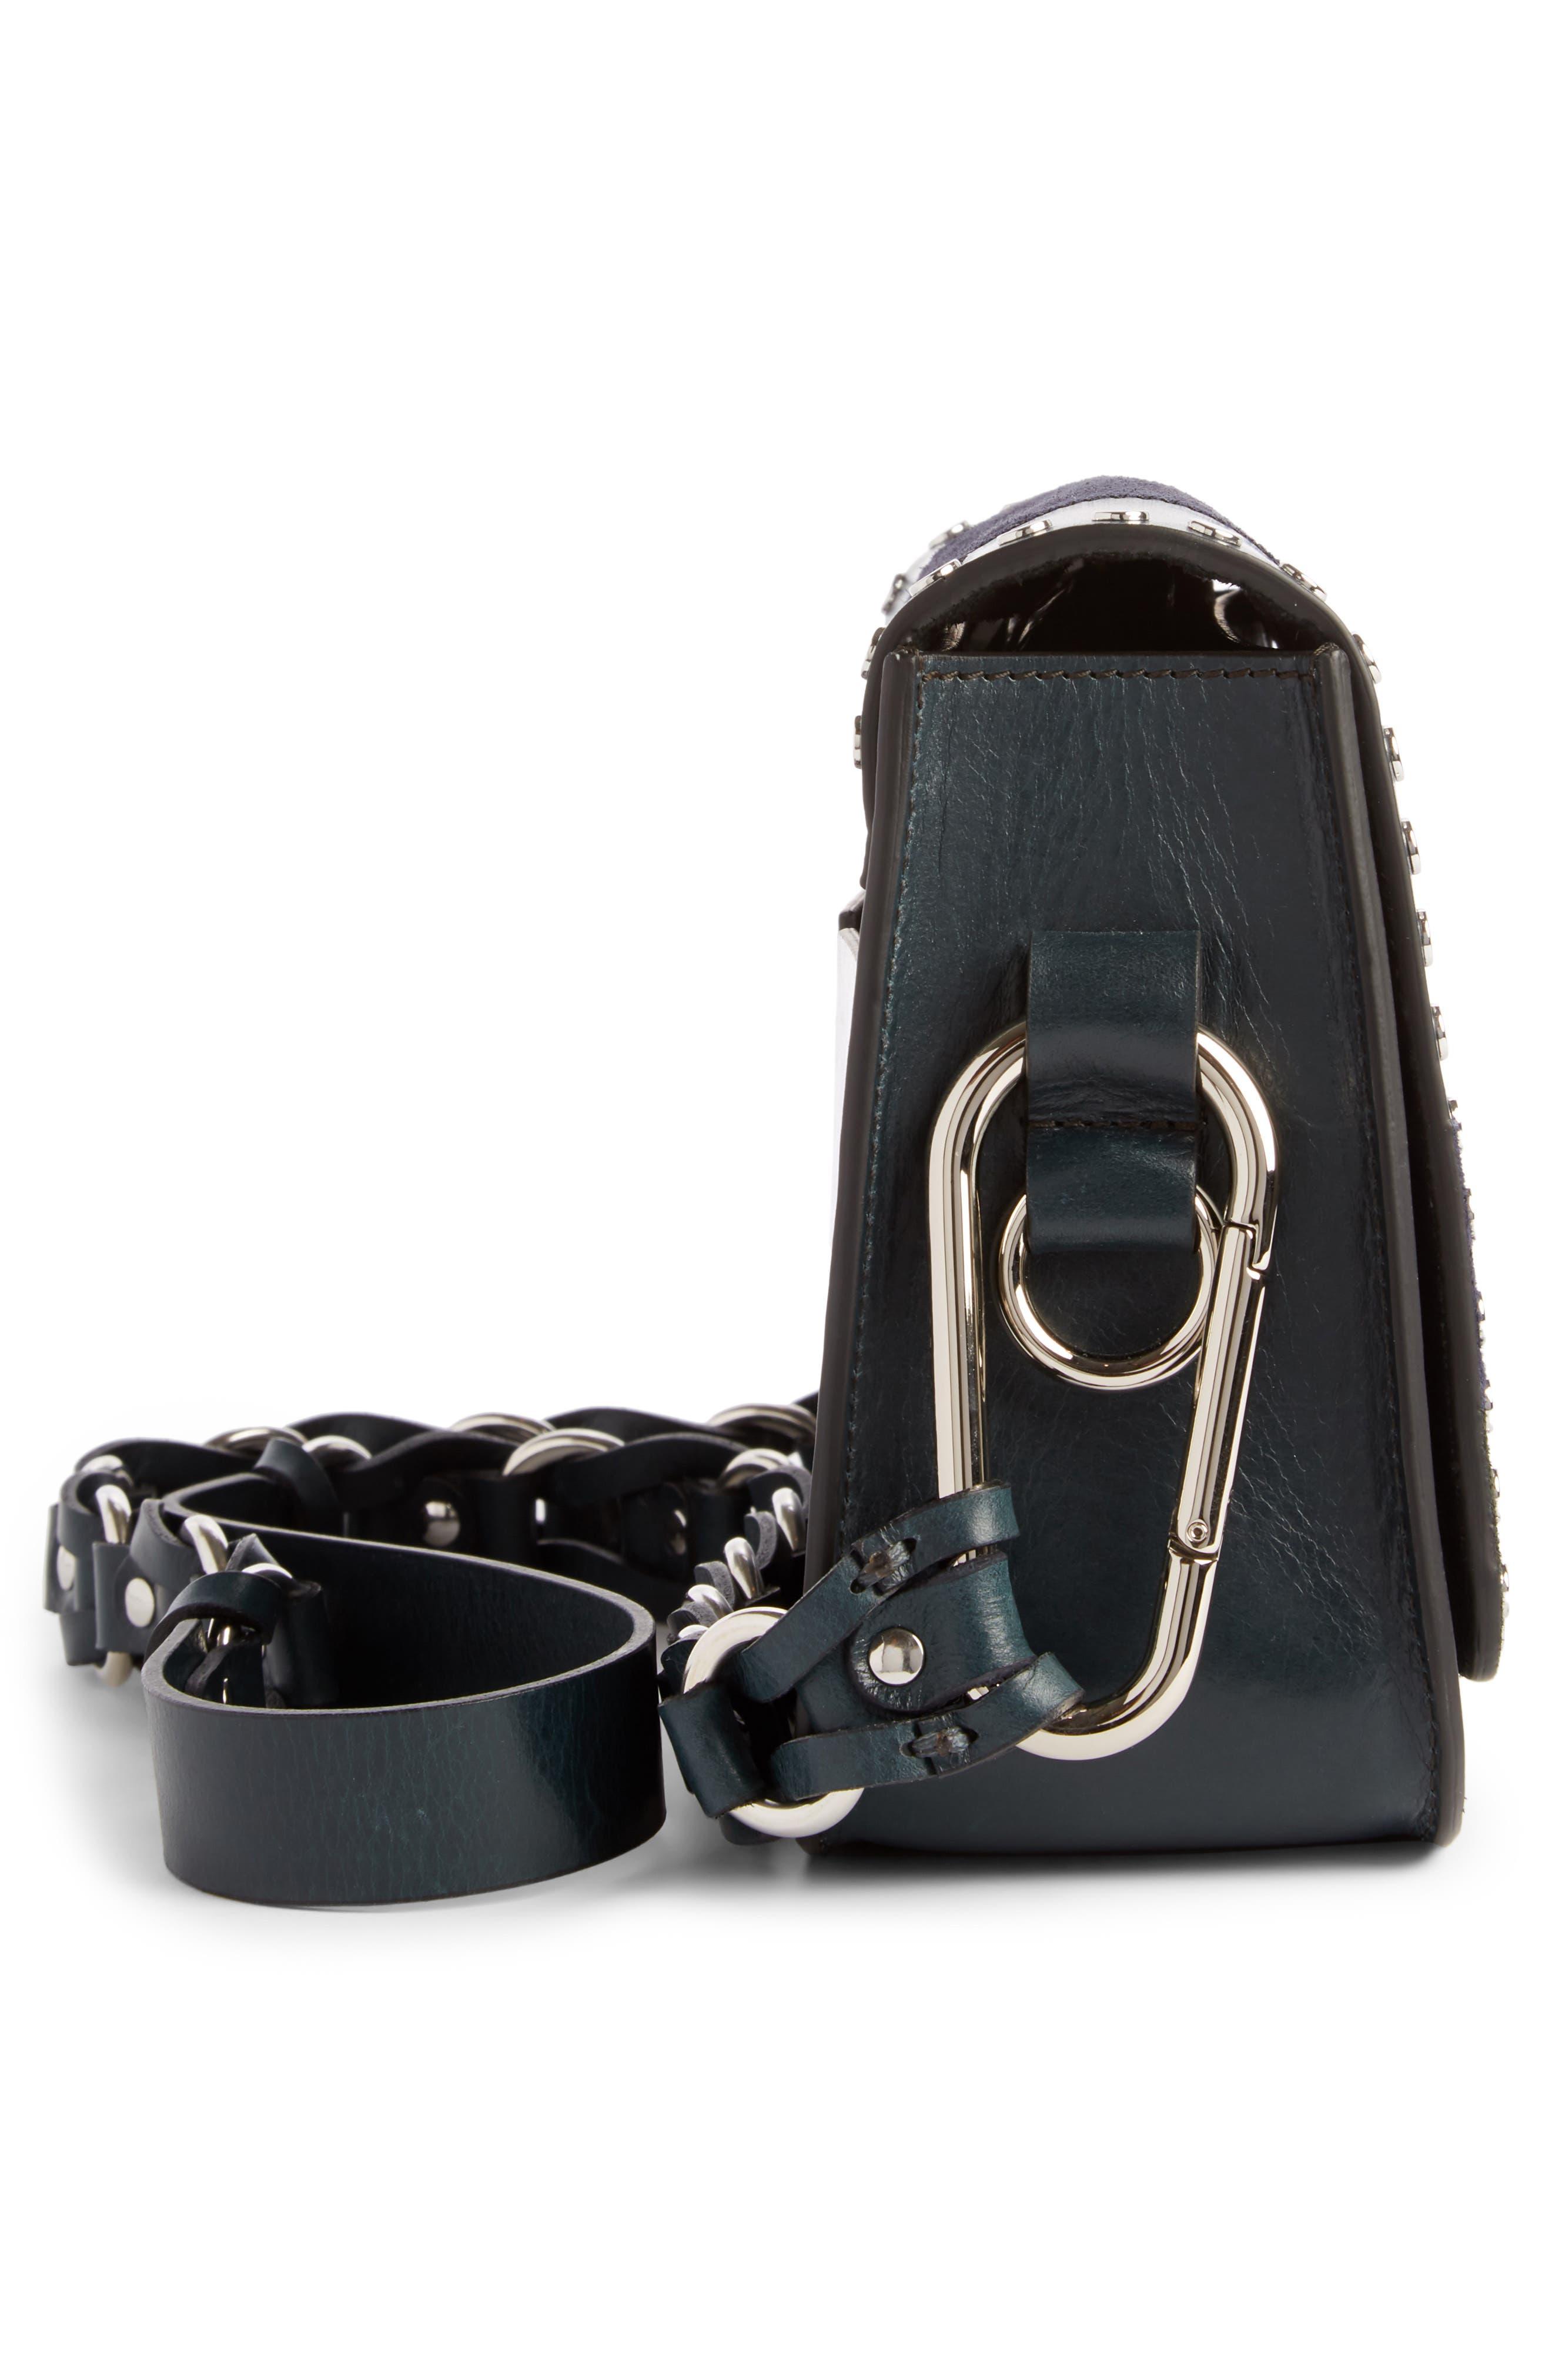 Calibar Patchwork Leather Crossbody Bag,                             Alternate thumbnail 3, color,